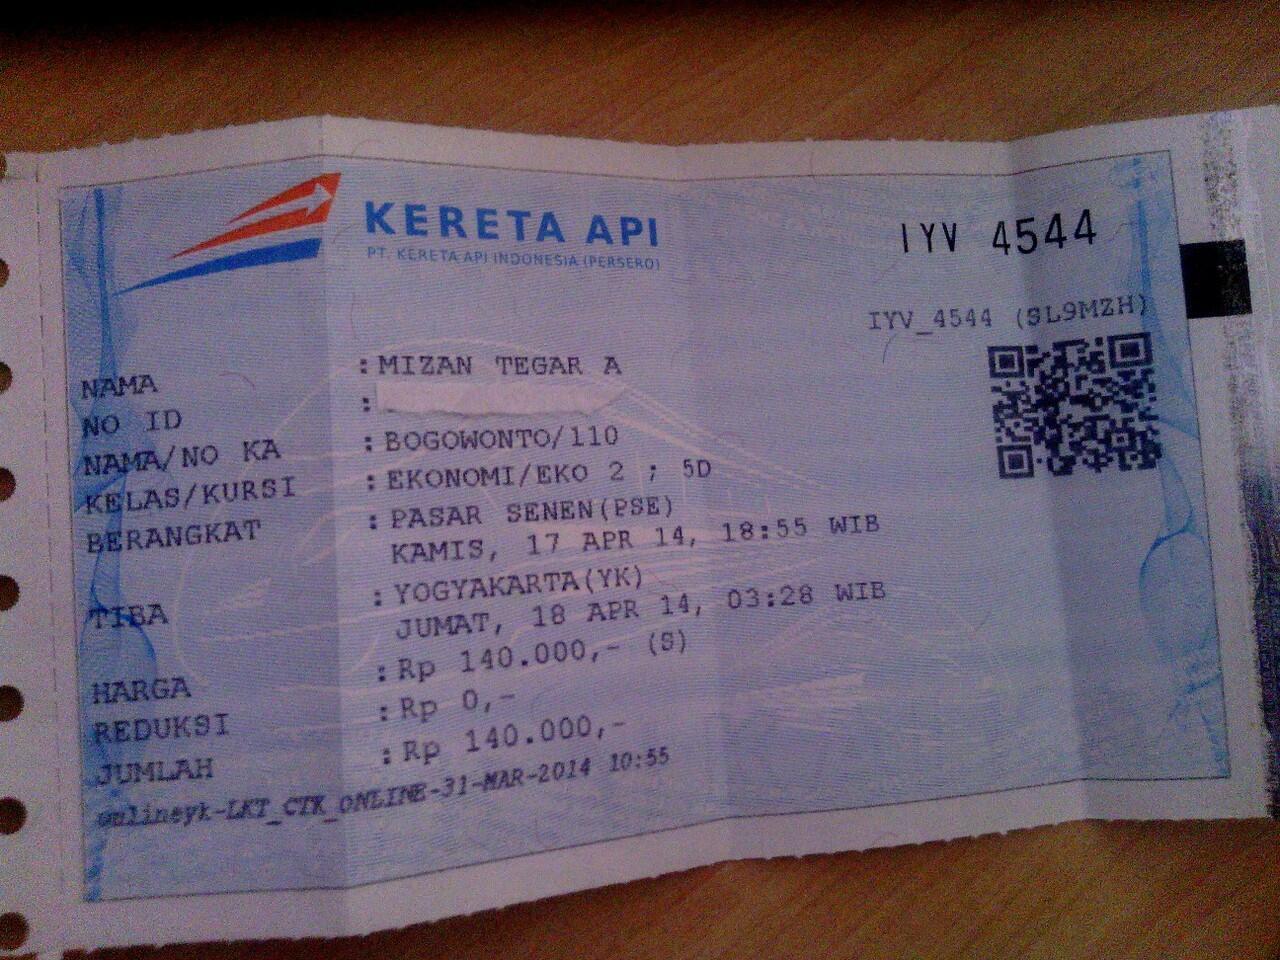 Terjual Jual Tiket Kereta Bogowonto Long Weekend Tgl 17 April Jakarta Jogja